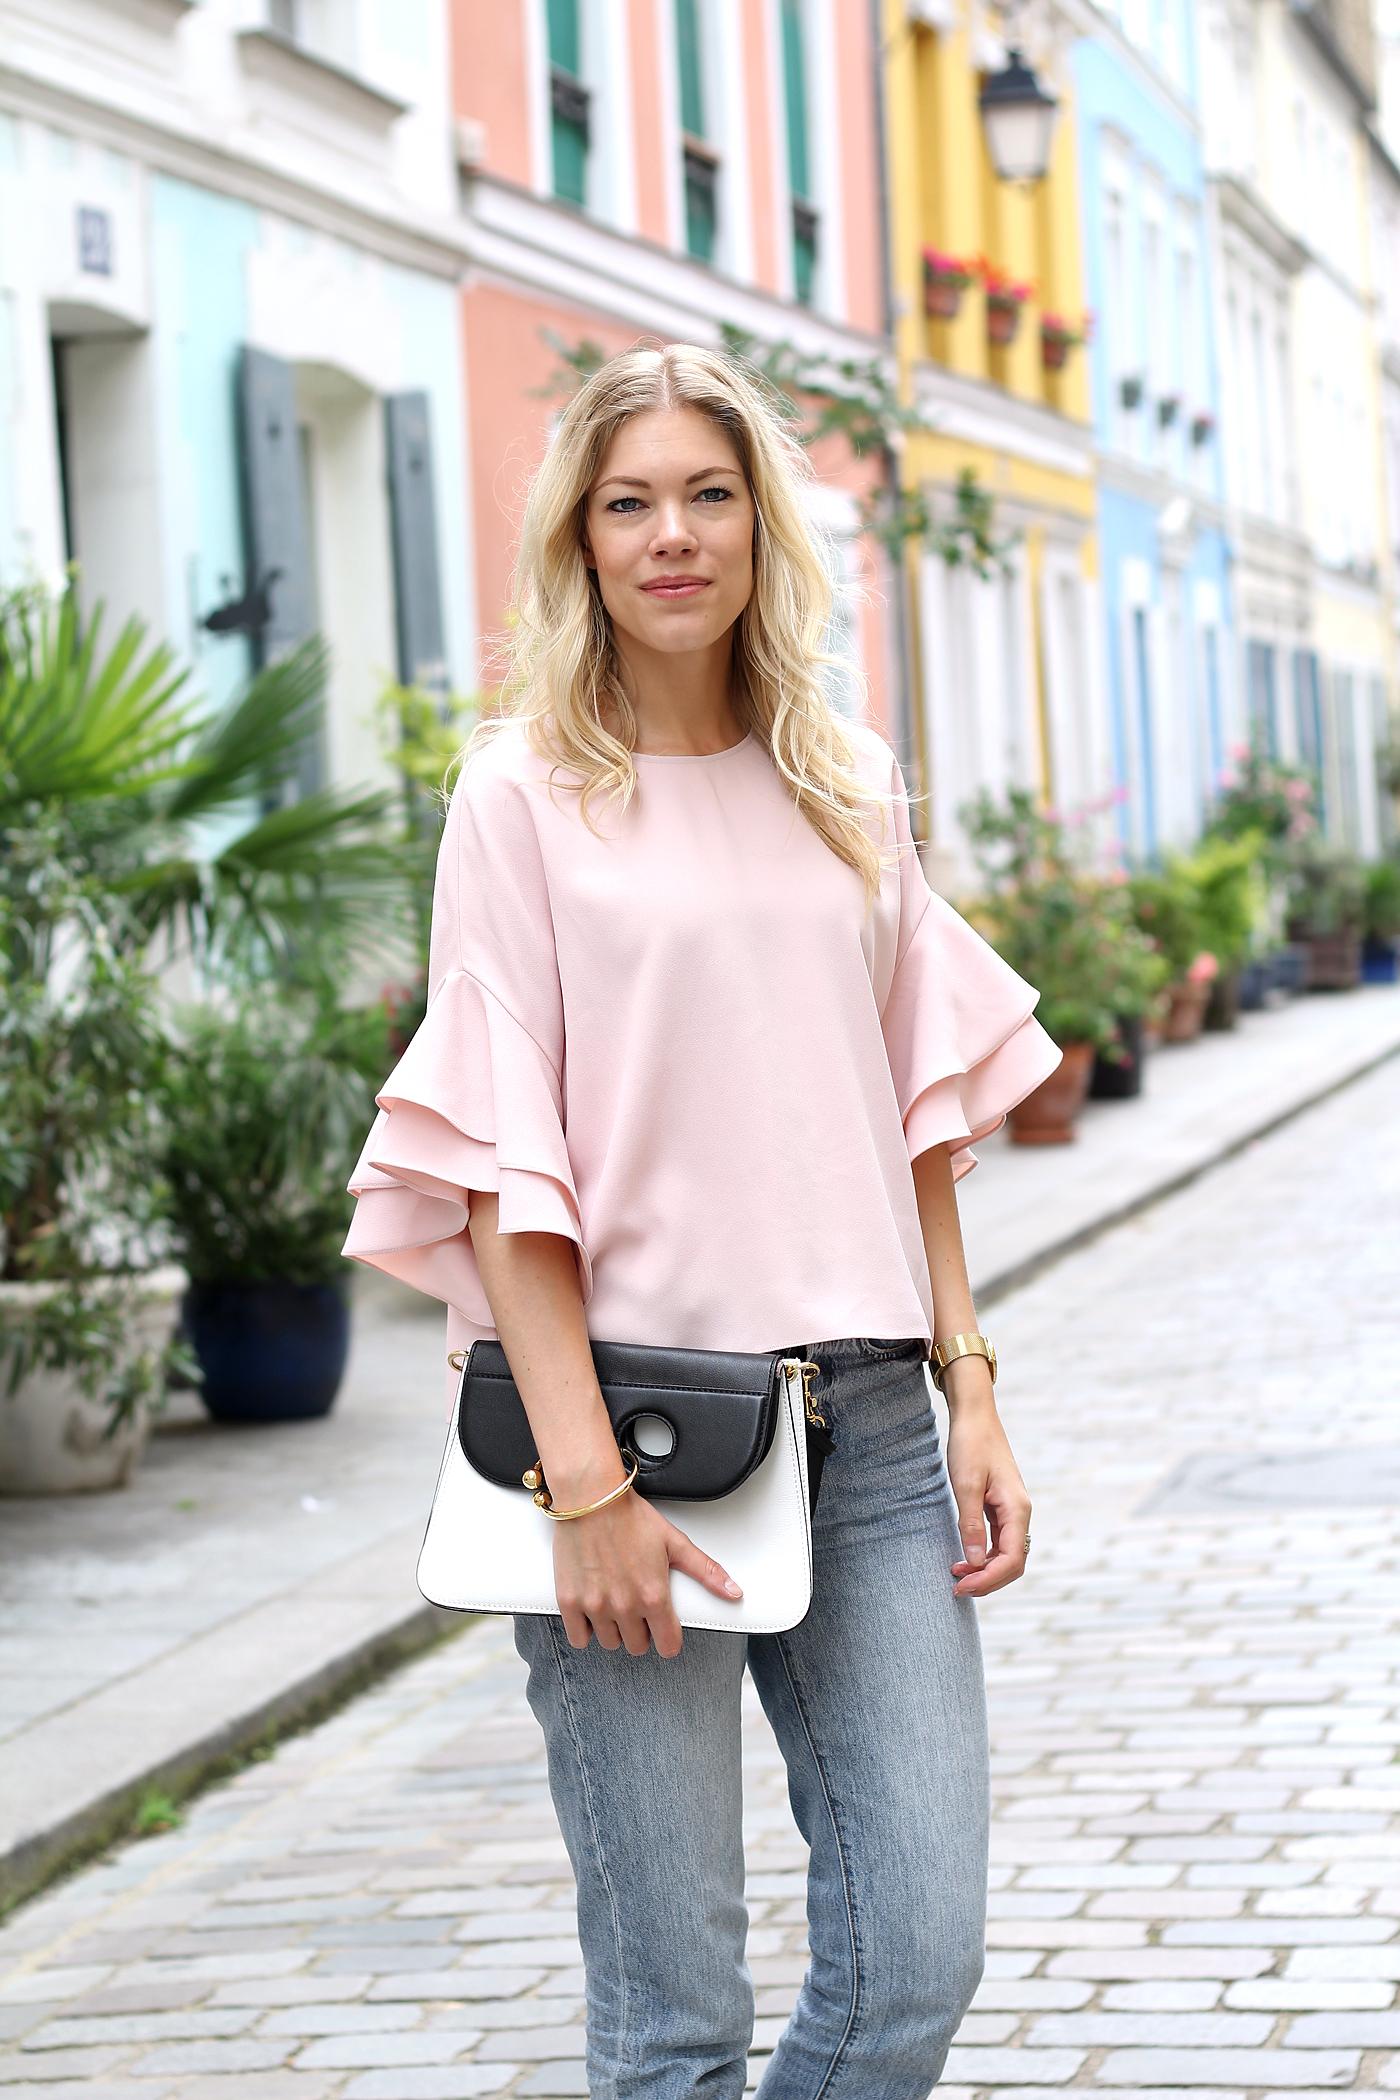 somehappyshoes_fashionblog_zara_volants_top_Paris_J.W.Anderson_pierce_bag2